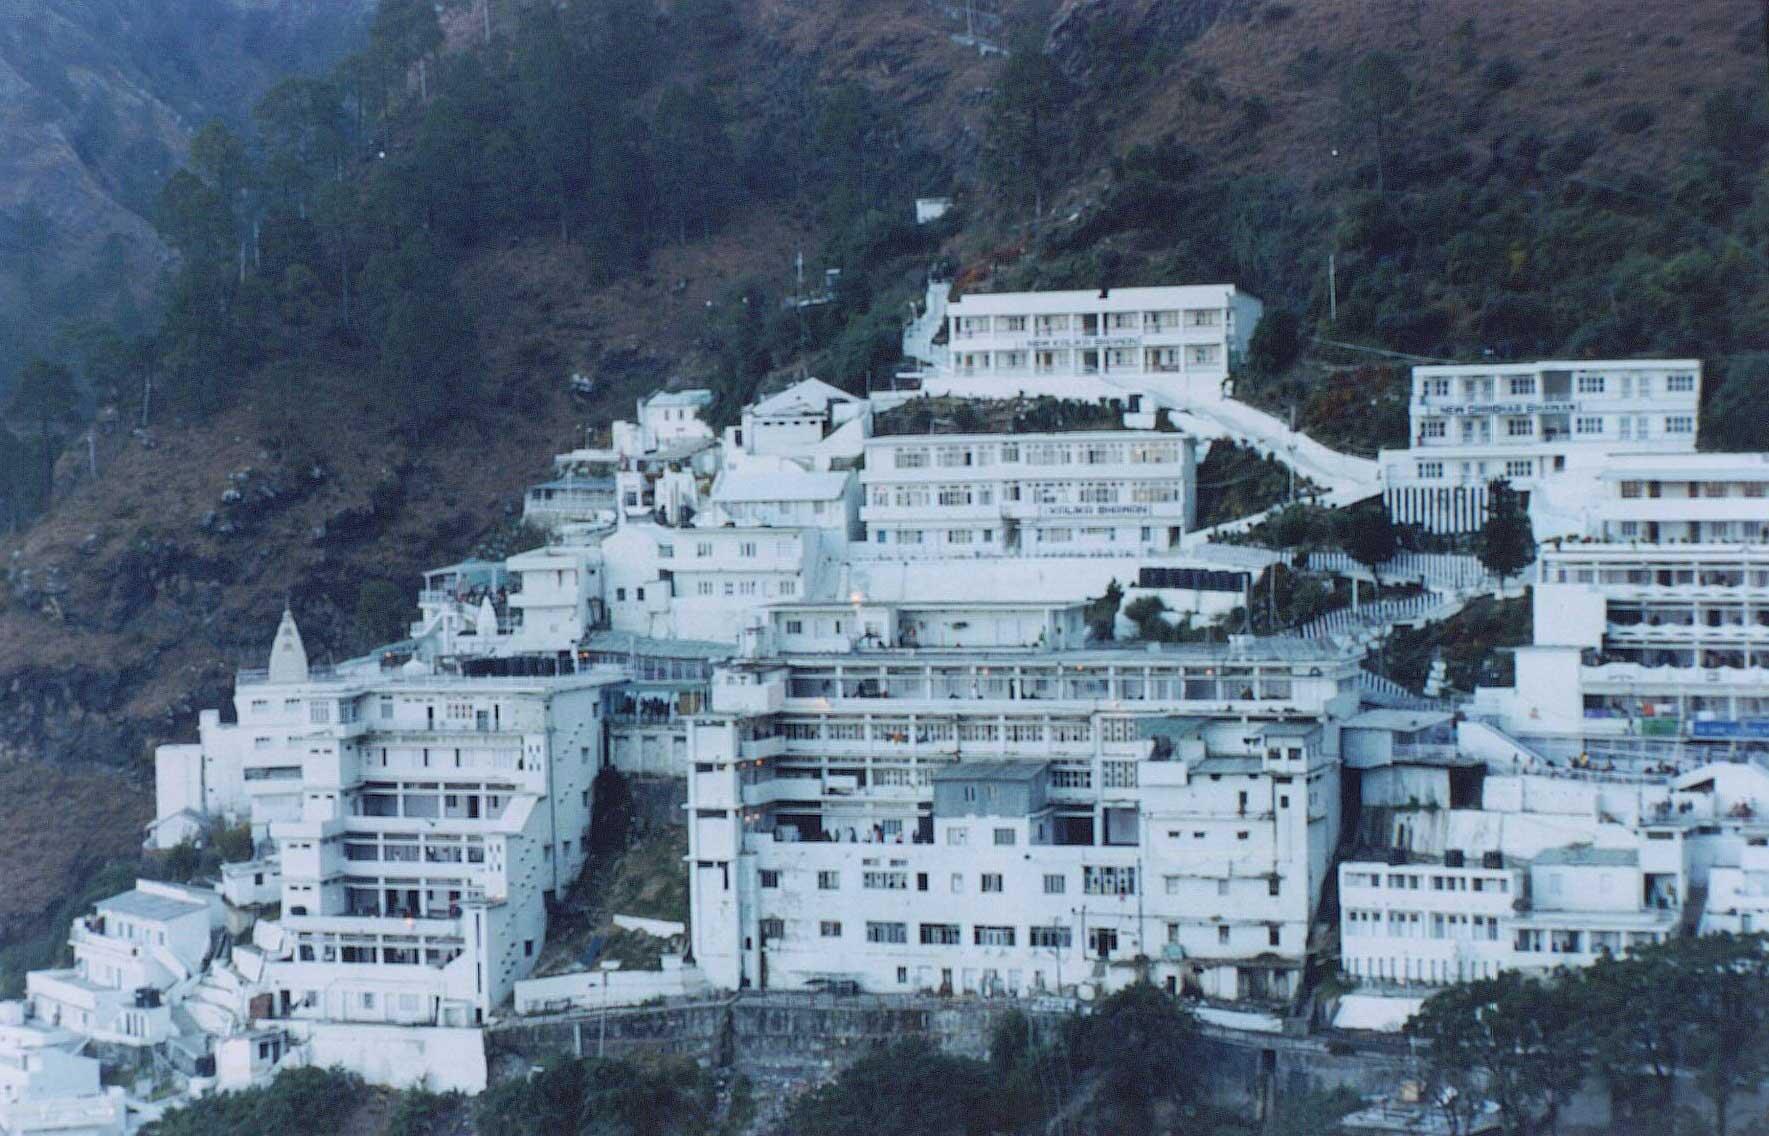 shrine of shri mata vaishno devi - udhampur photos, images and